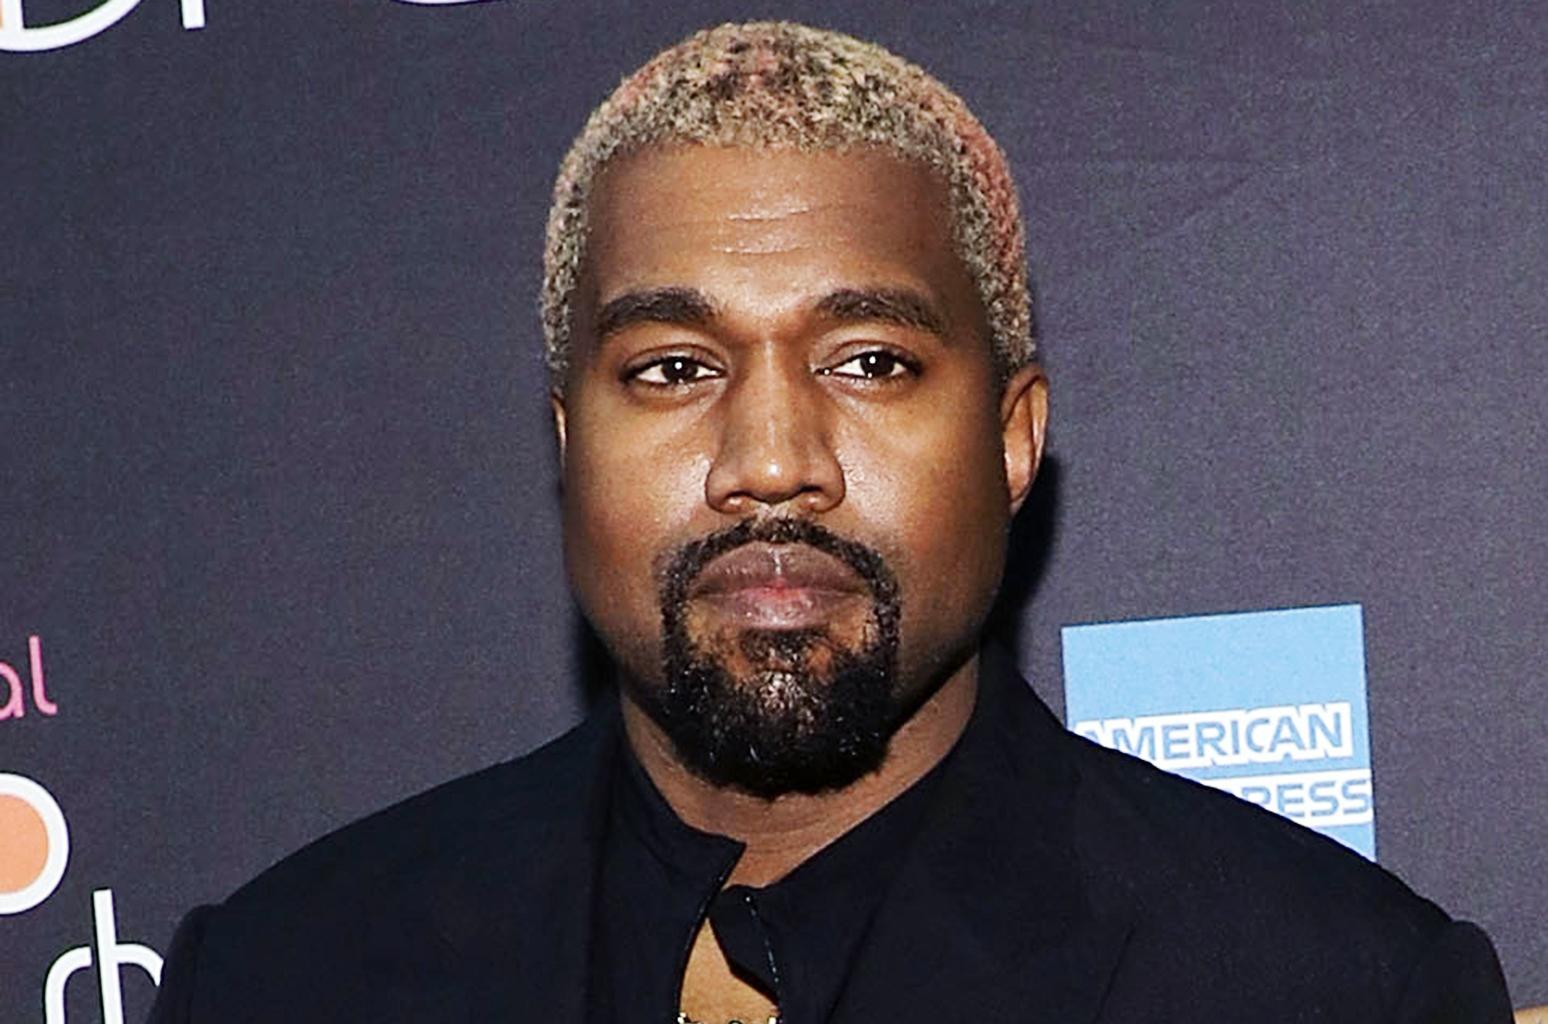 Kanye West spiritual journey